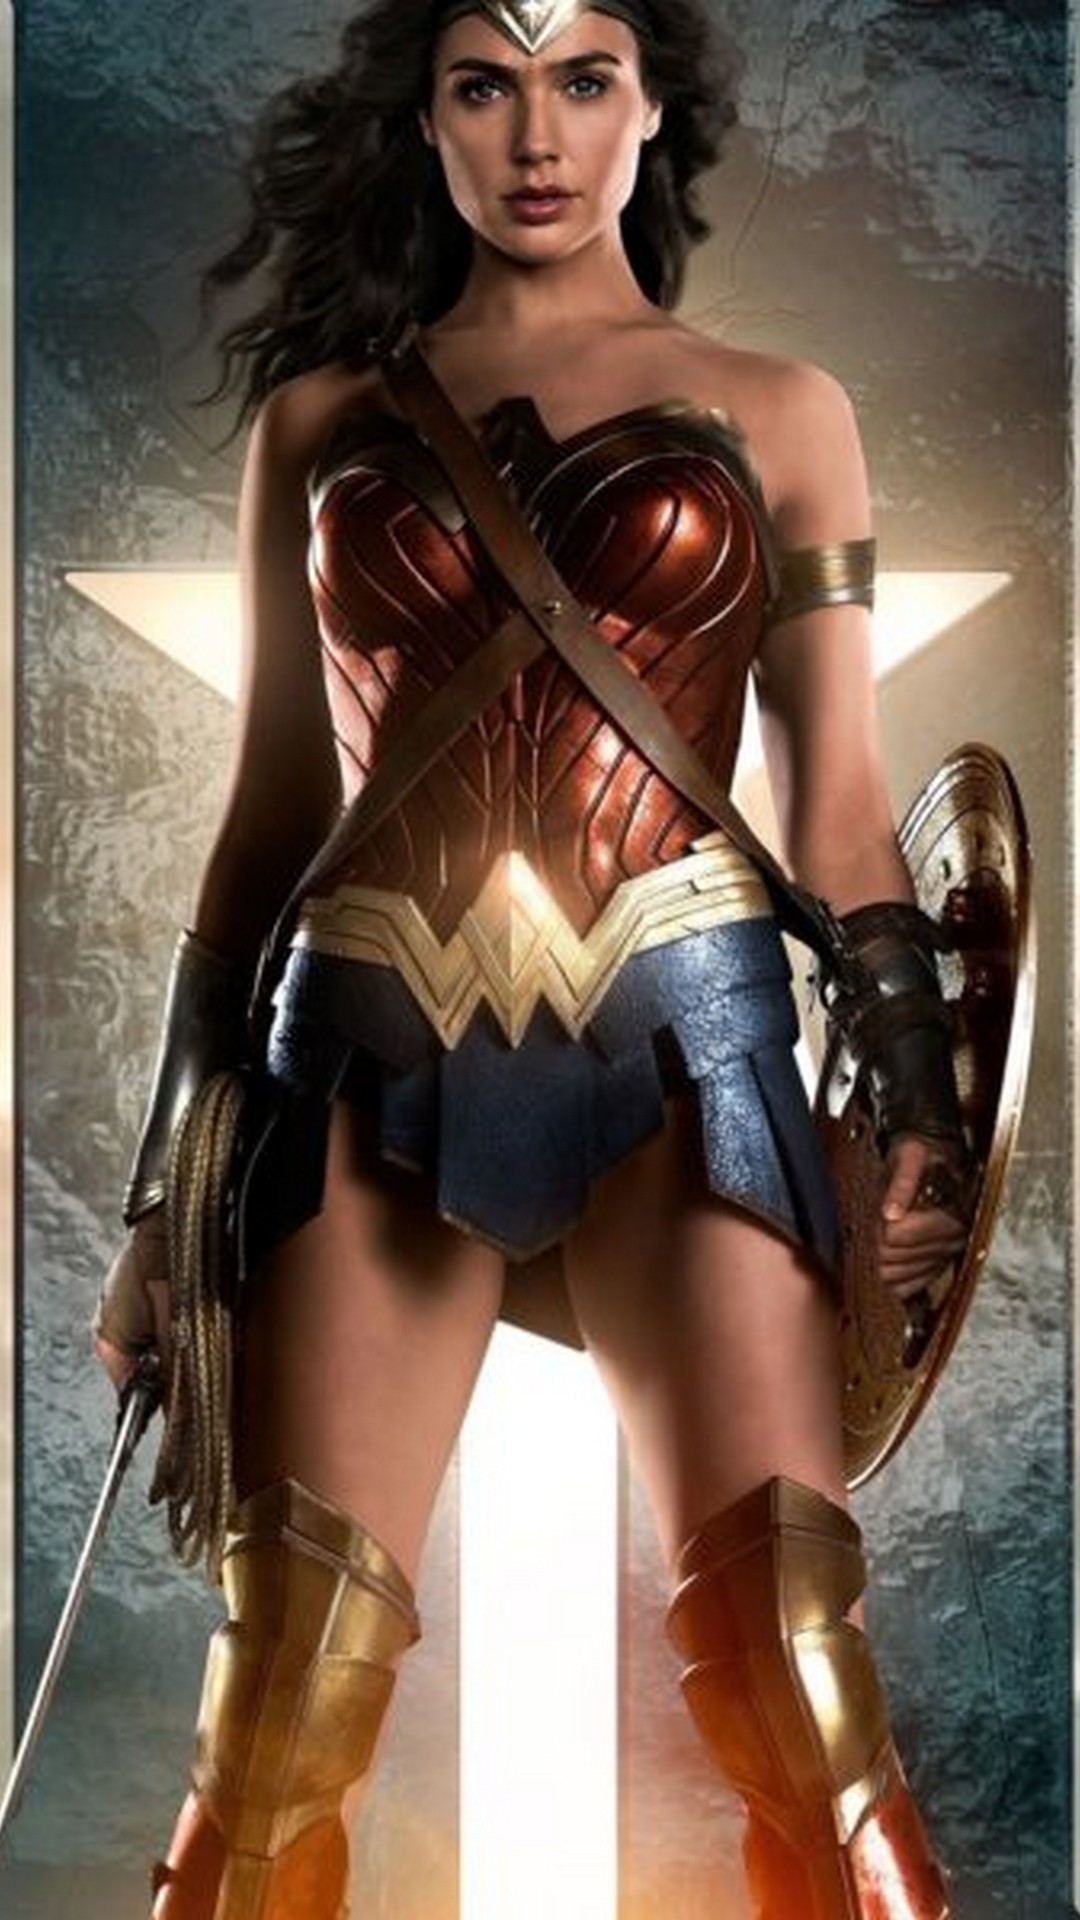 Res: 1080x1920, Wonder Woman Justice Leauge Gal Gadot Wallpaper resolution